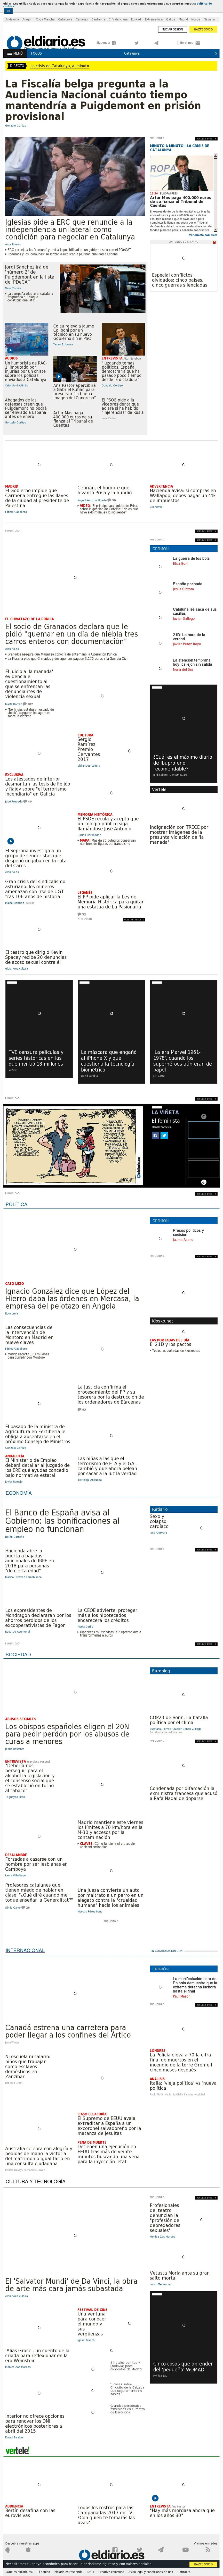 El Diario at Thursday Nov. 16, 2017, 3:04 p.m. UTC